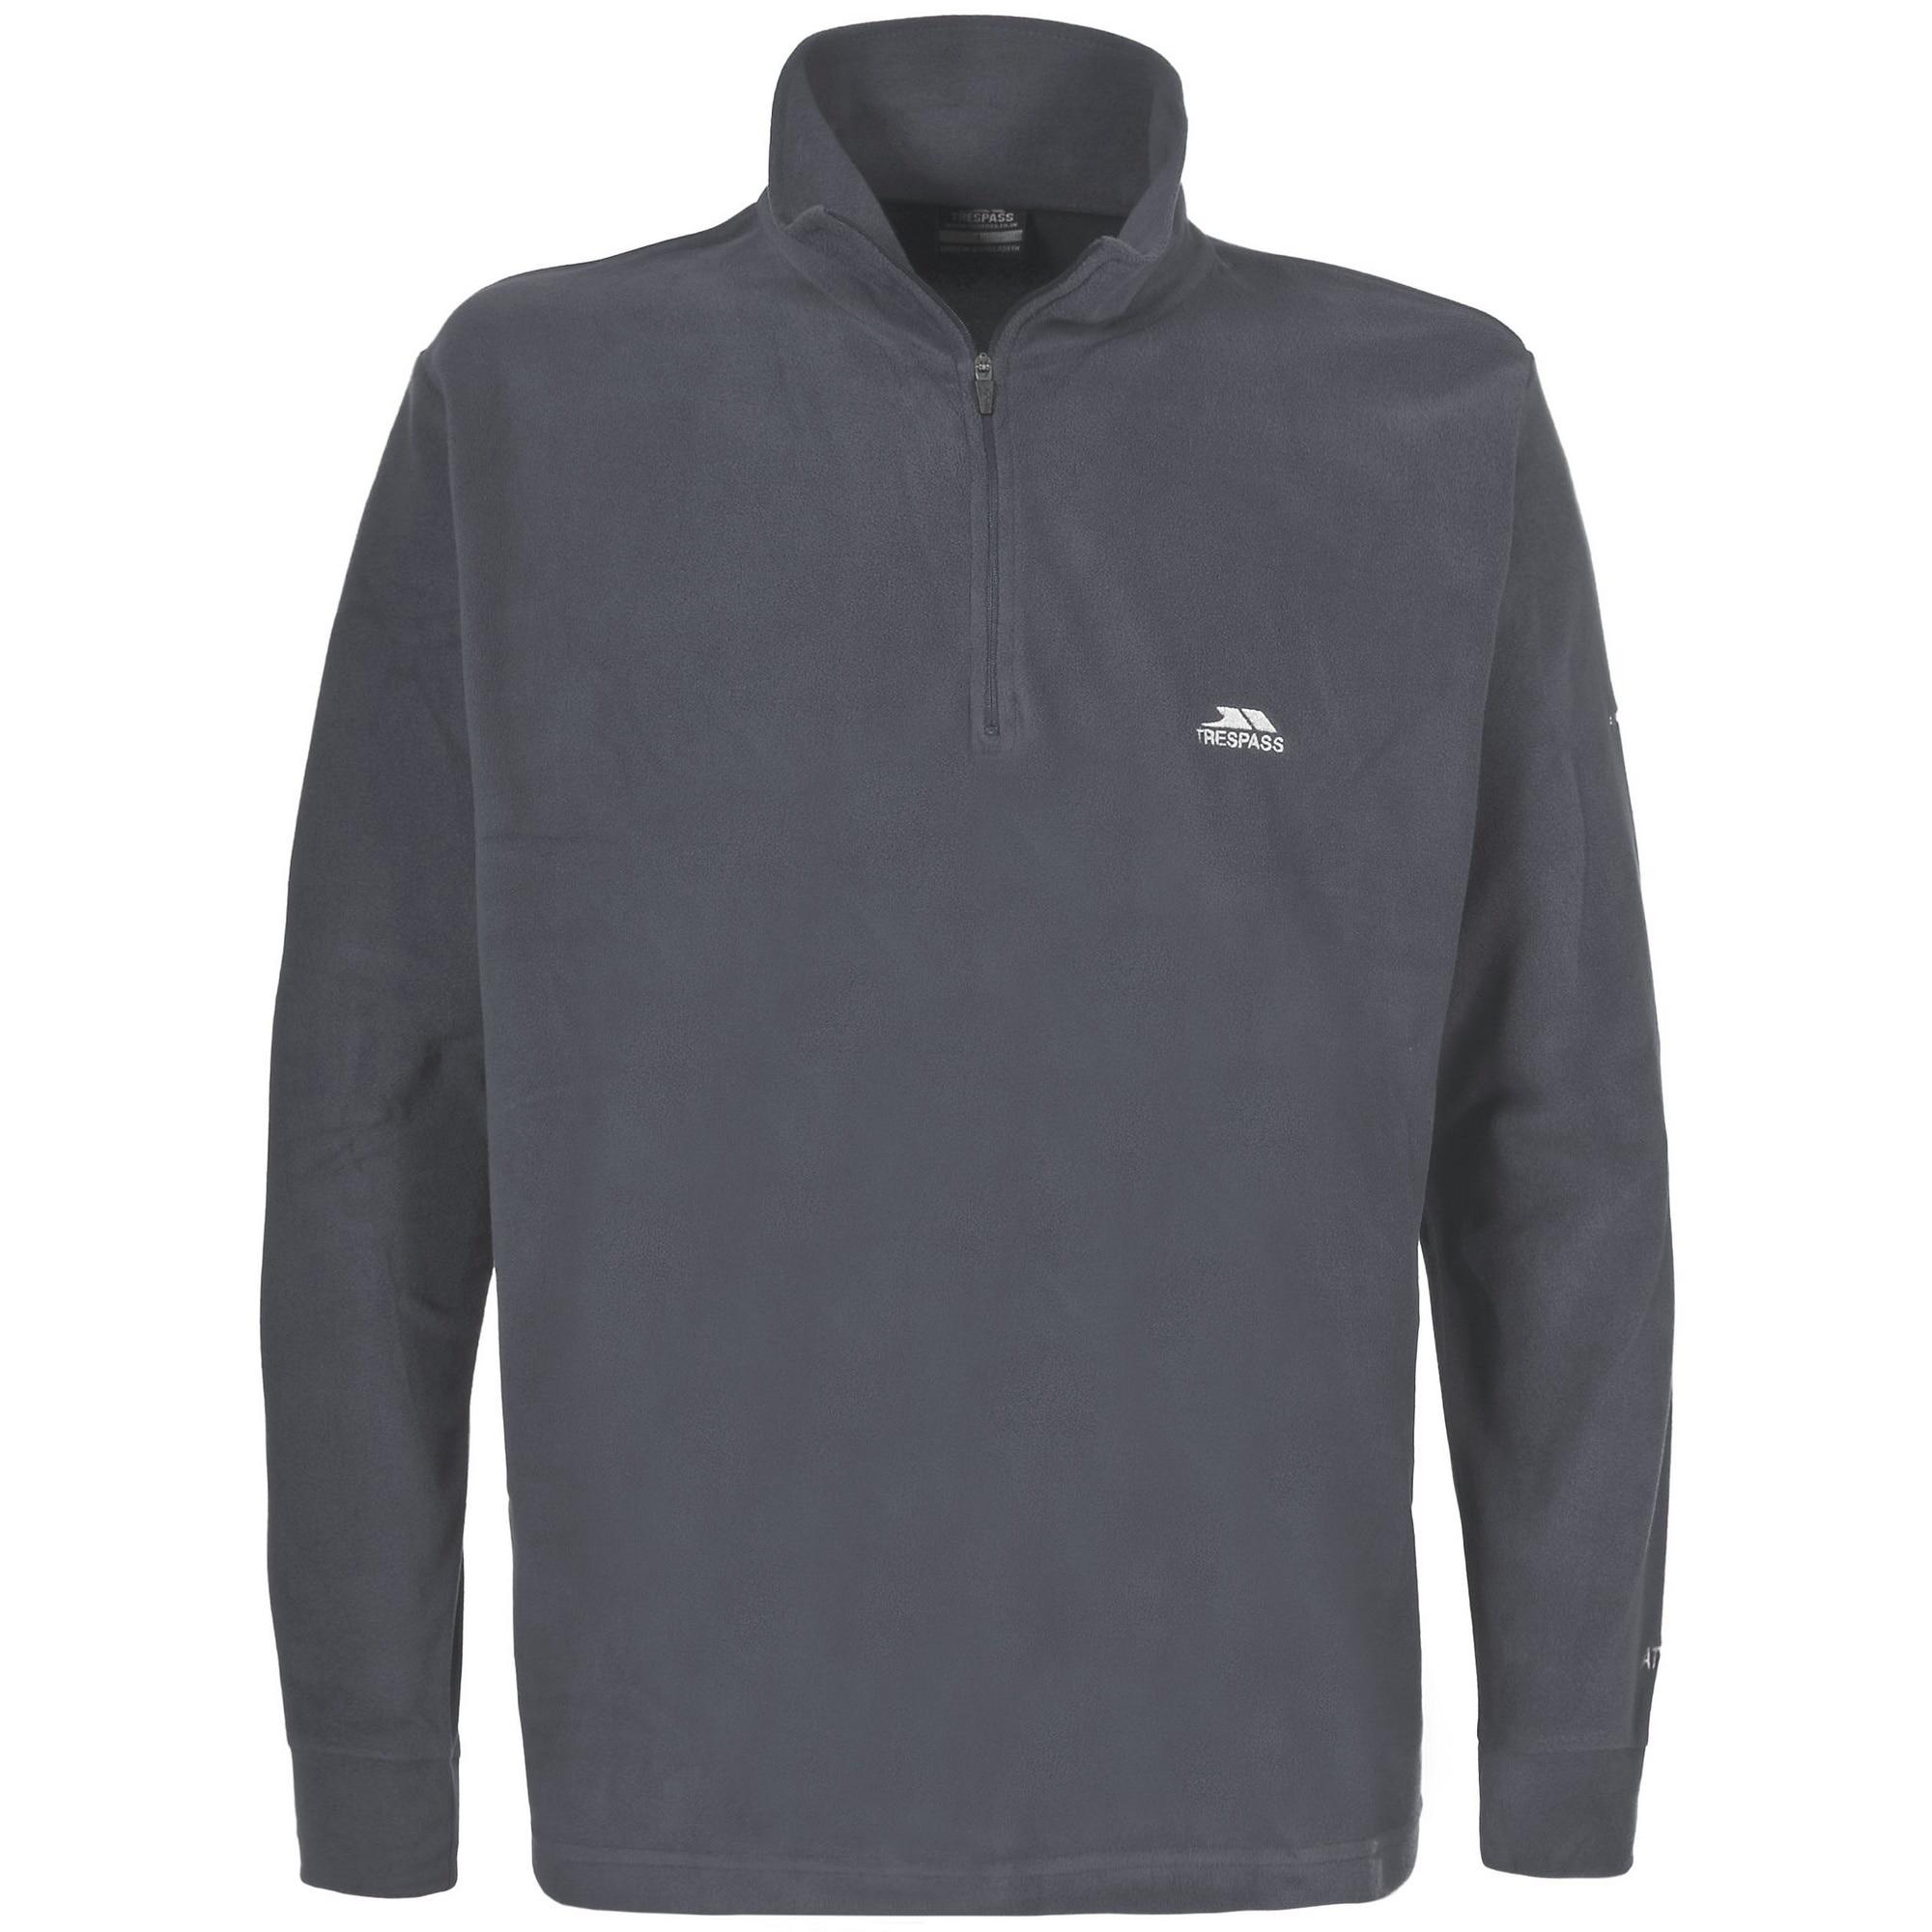 Trespass Fleecepullover Masonville Herren mit Reißverschluss bis zur Brust   Sportbekleidung   Grau   Fleece   Trespass